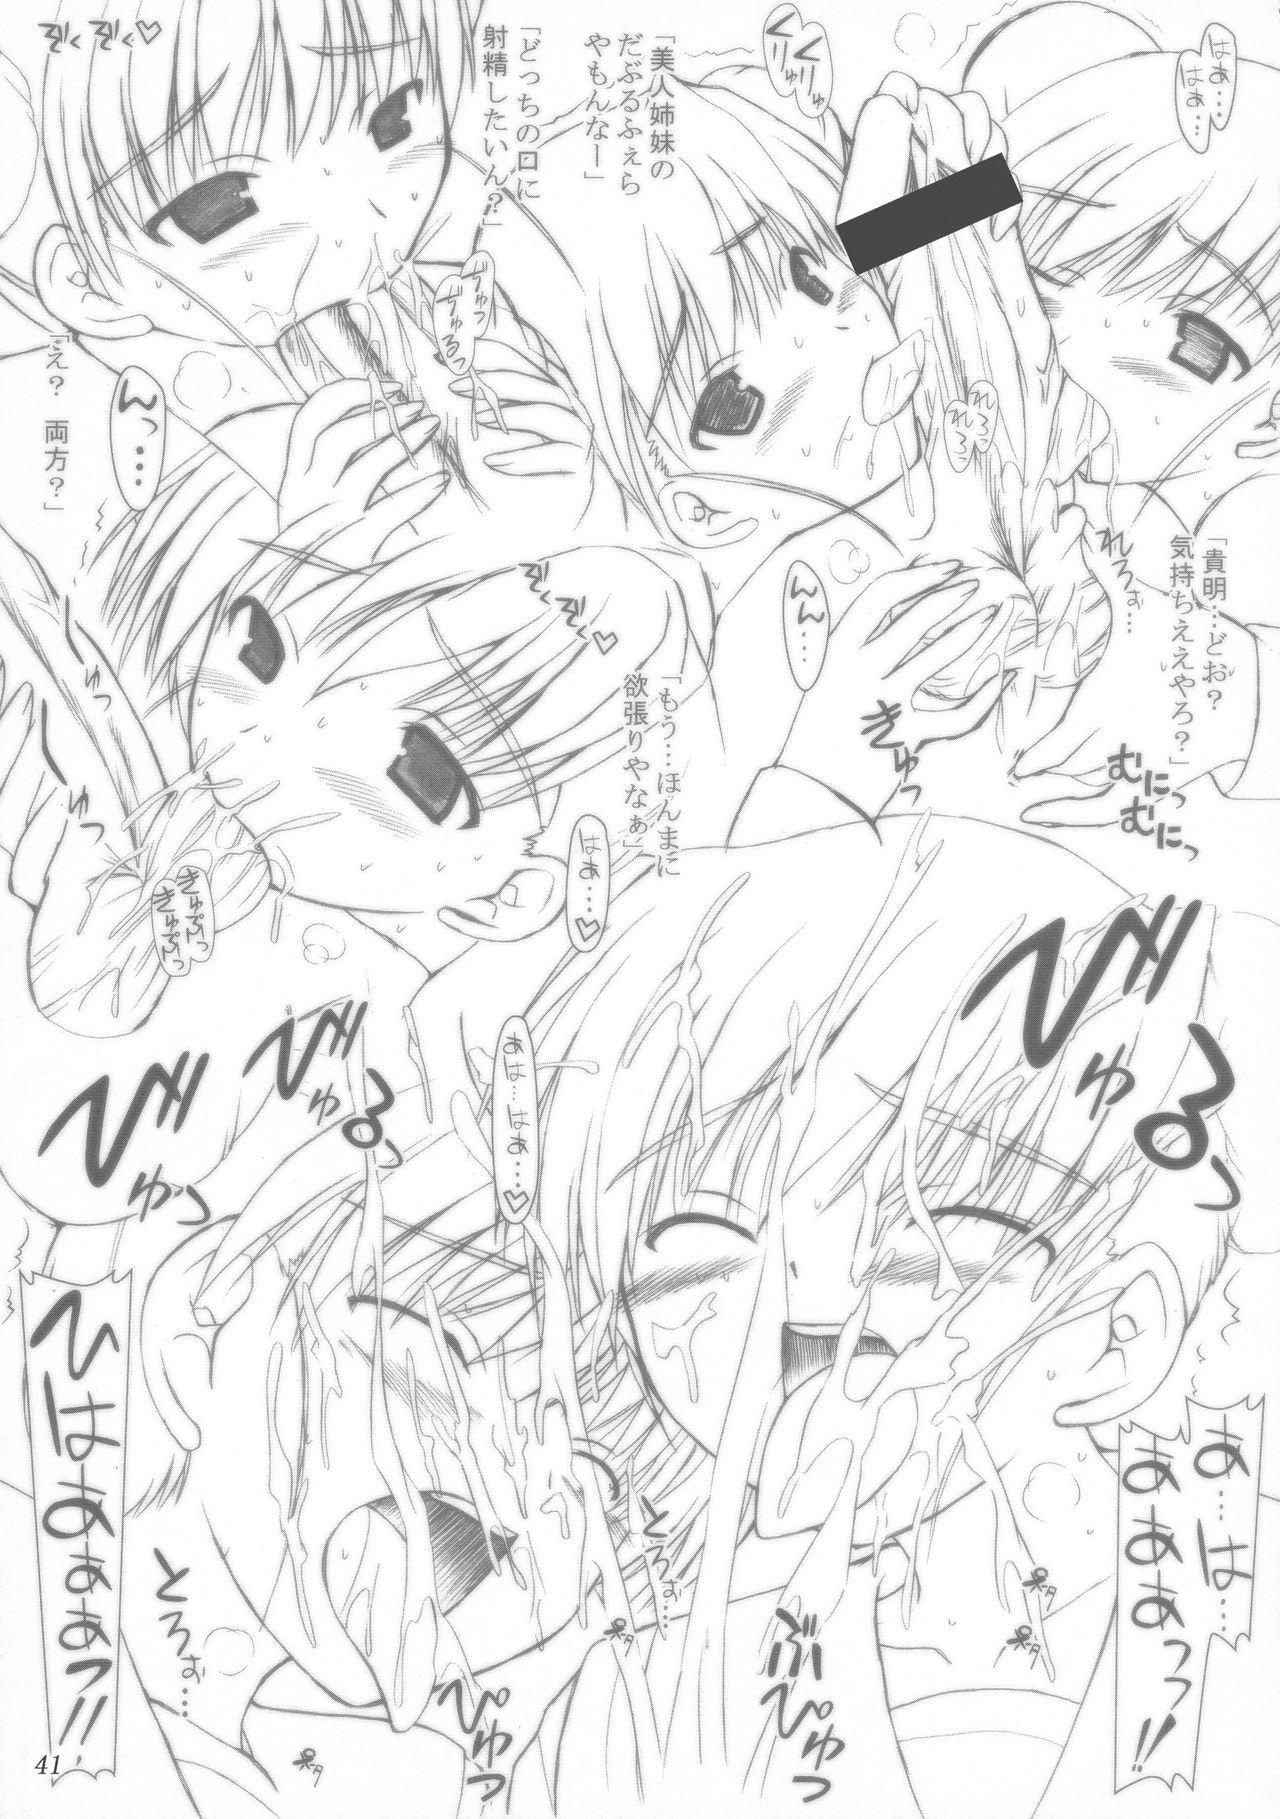 (C73) [ashitakara-ganbaru (Yameta Takashi)] ZIG-ZIG-ZIG 3 -2004~2005- (Various) 40